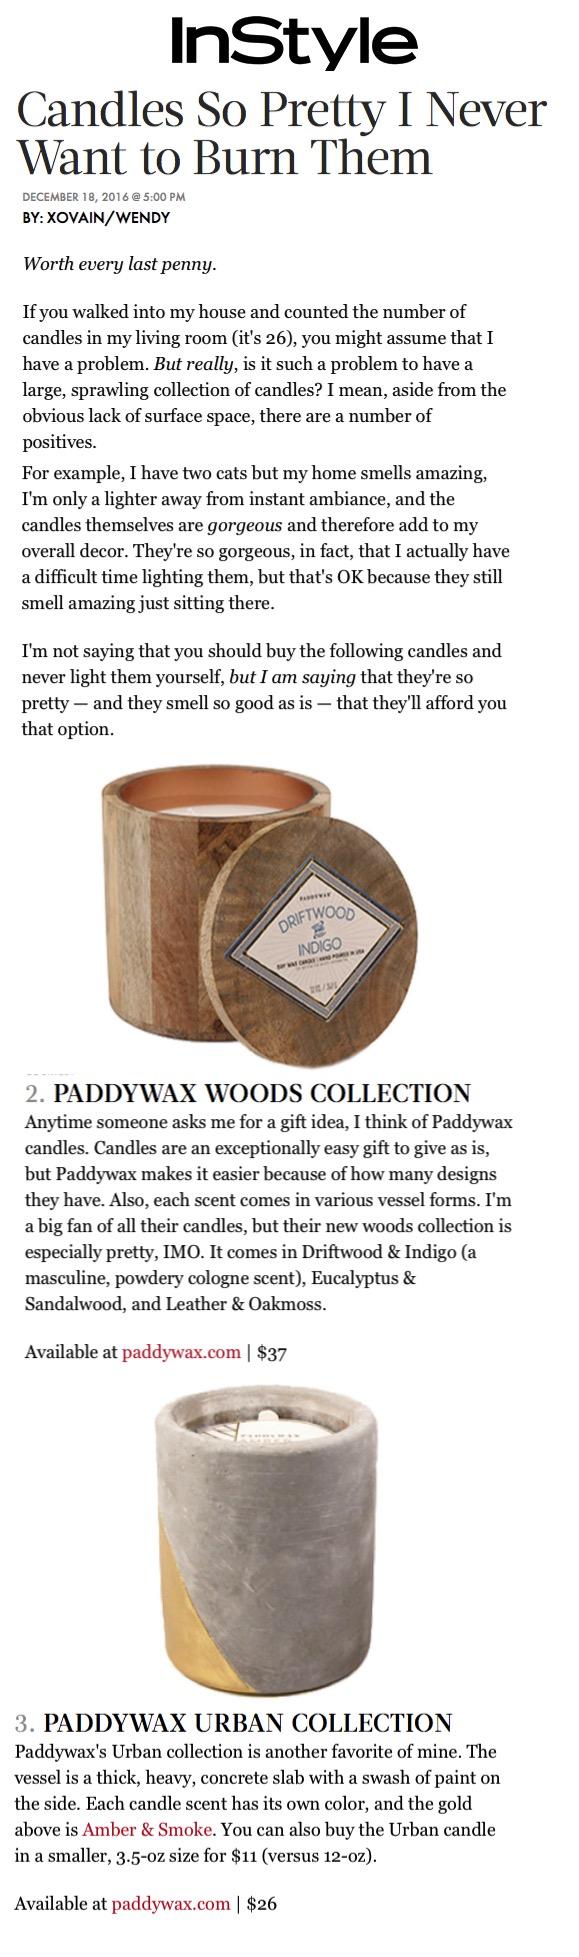 Instlye.com December 2016 Paddywax.jpeg